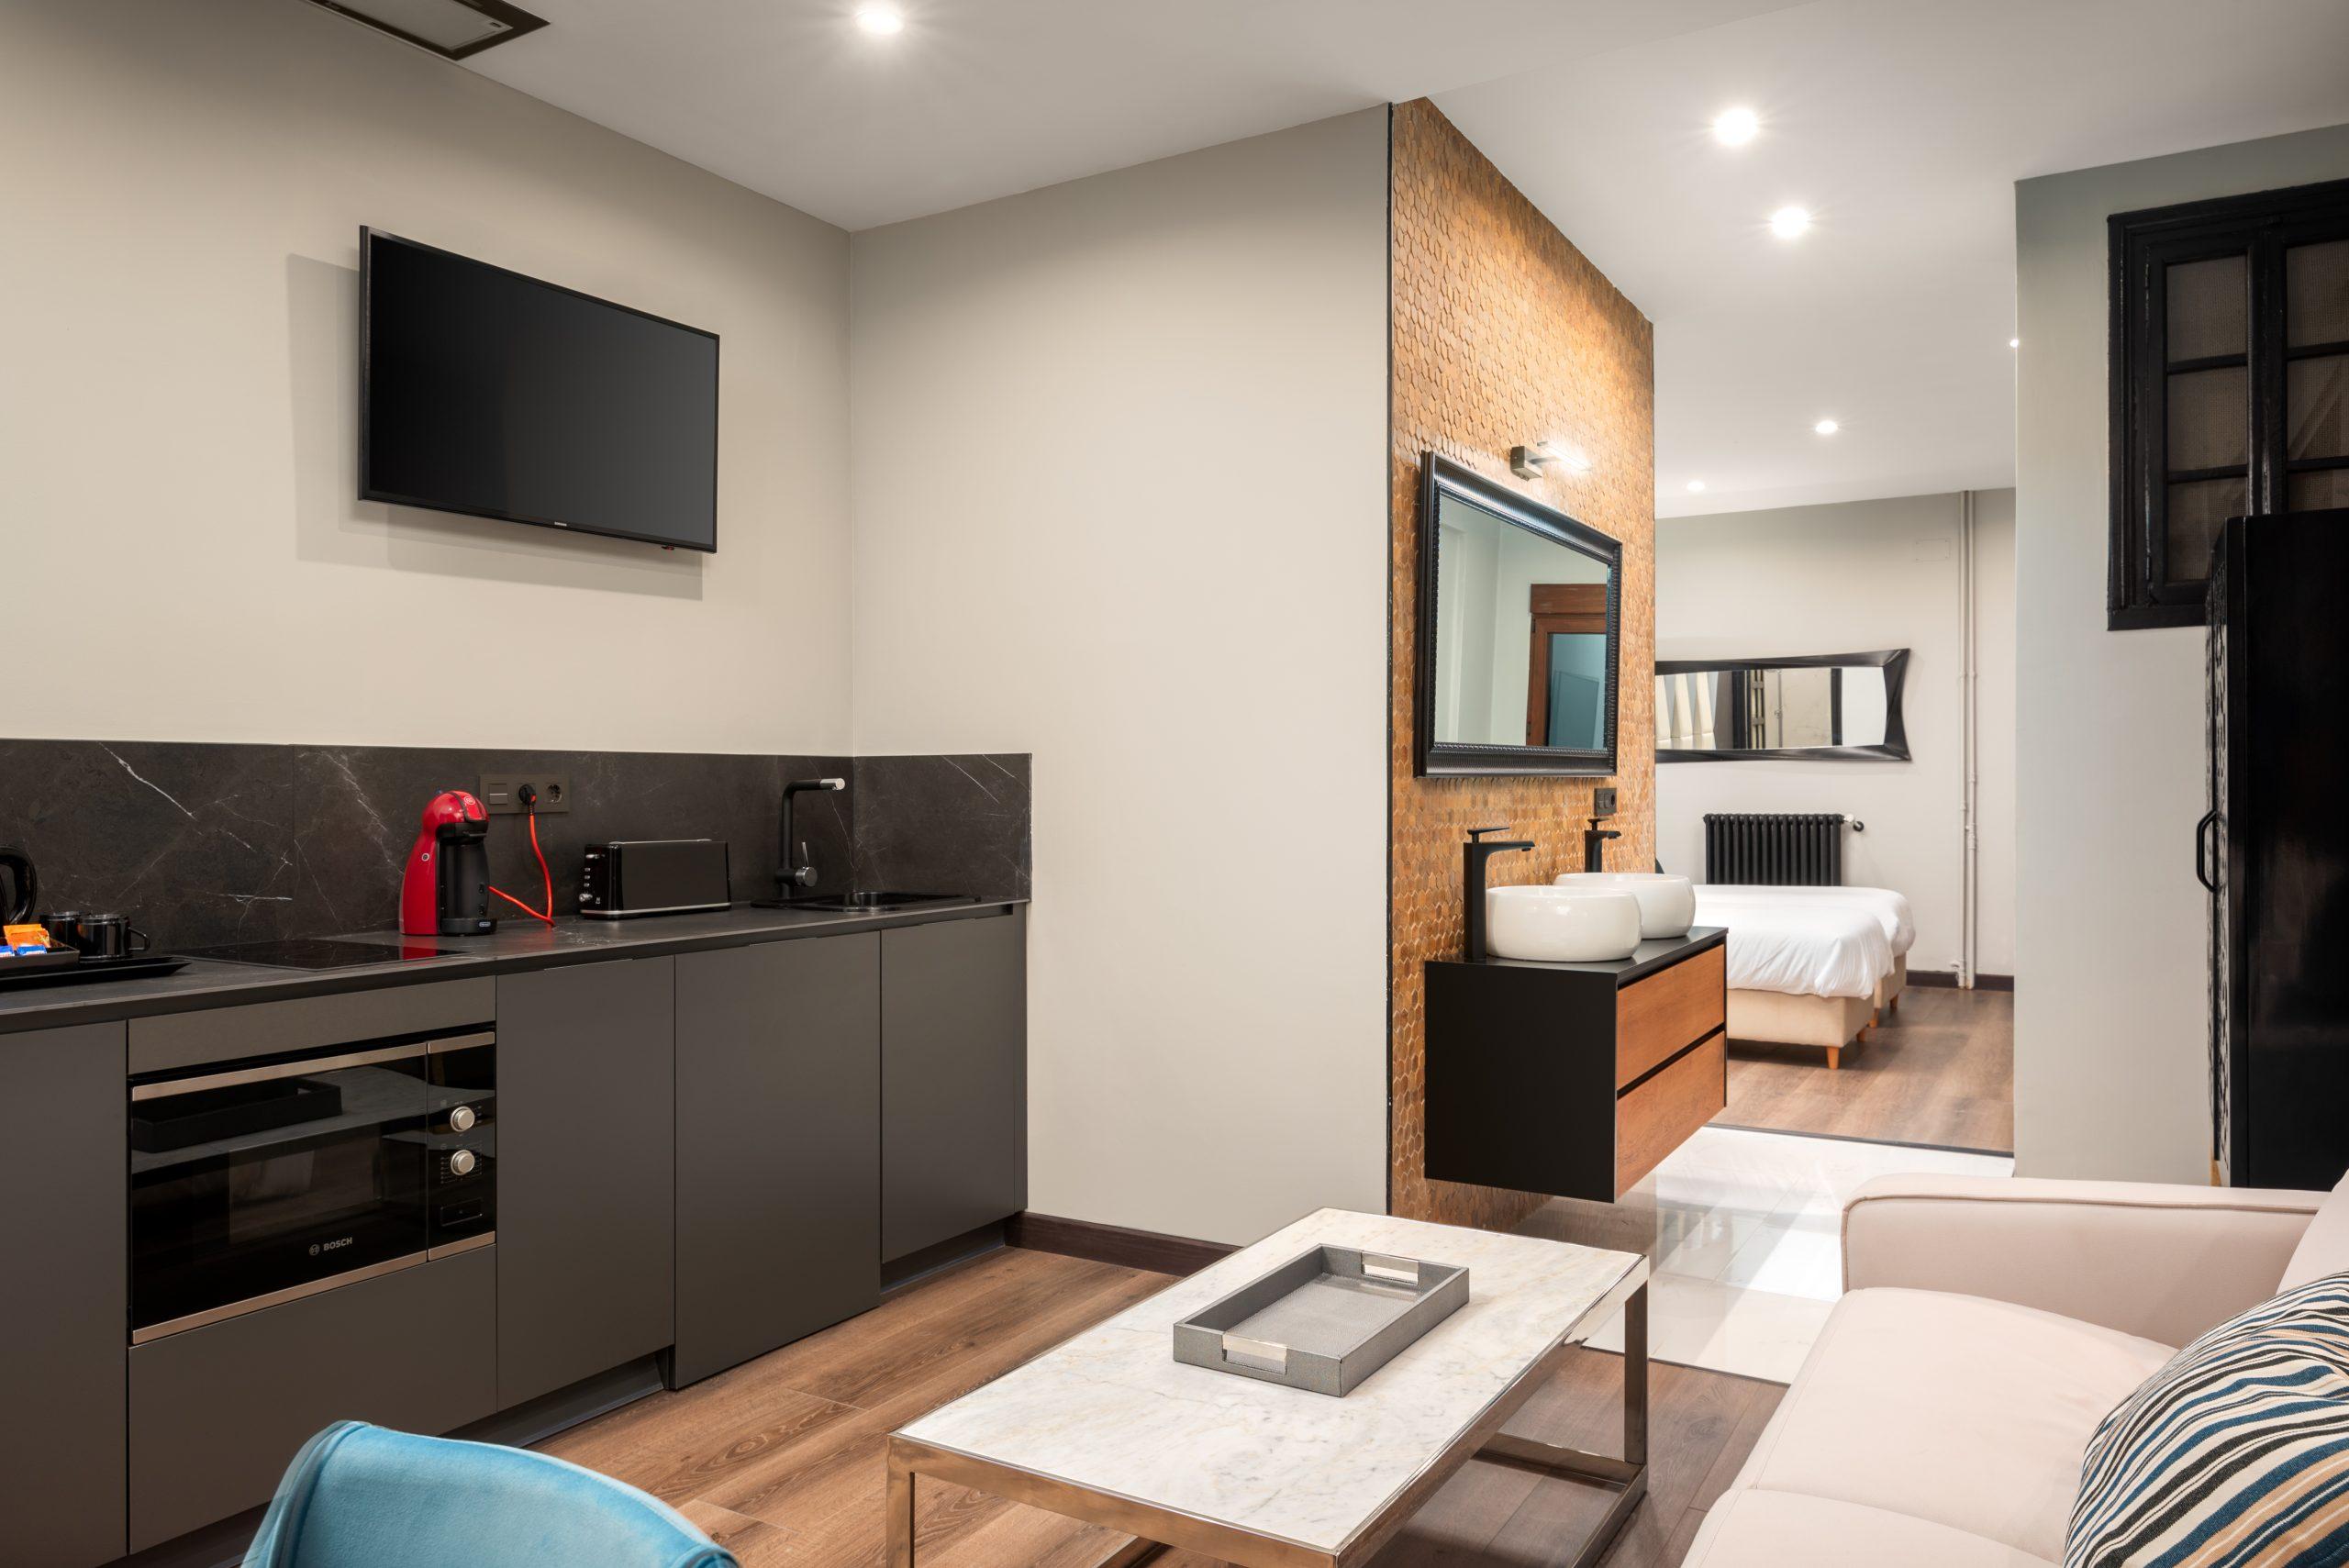 Apartamento-Suite-Deluxe-63-Oviedo-1907-04